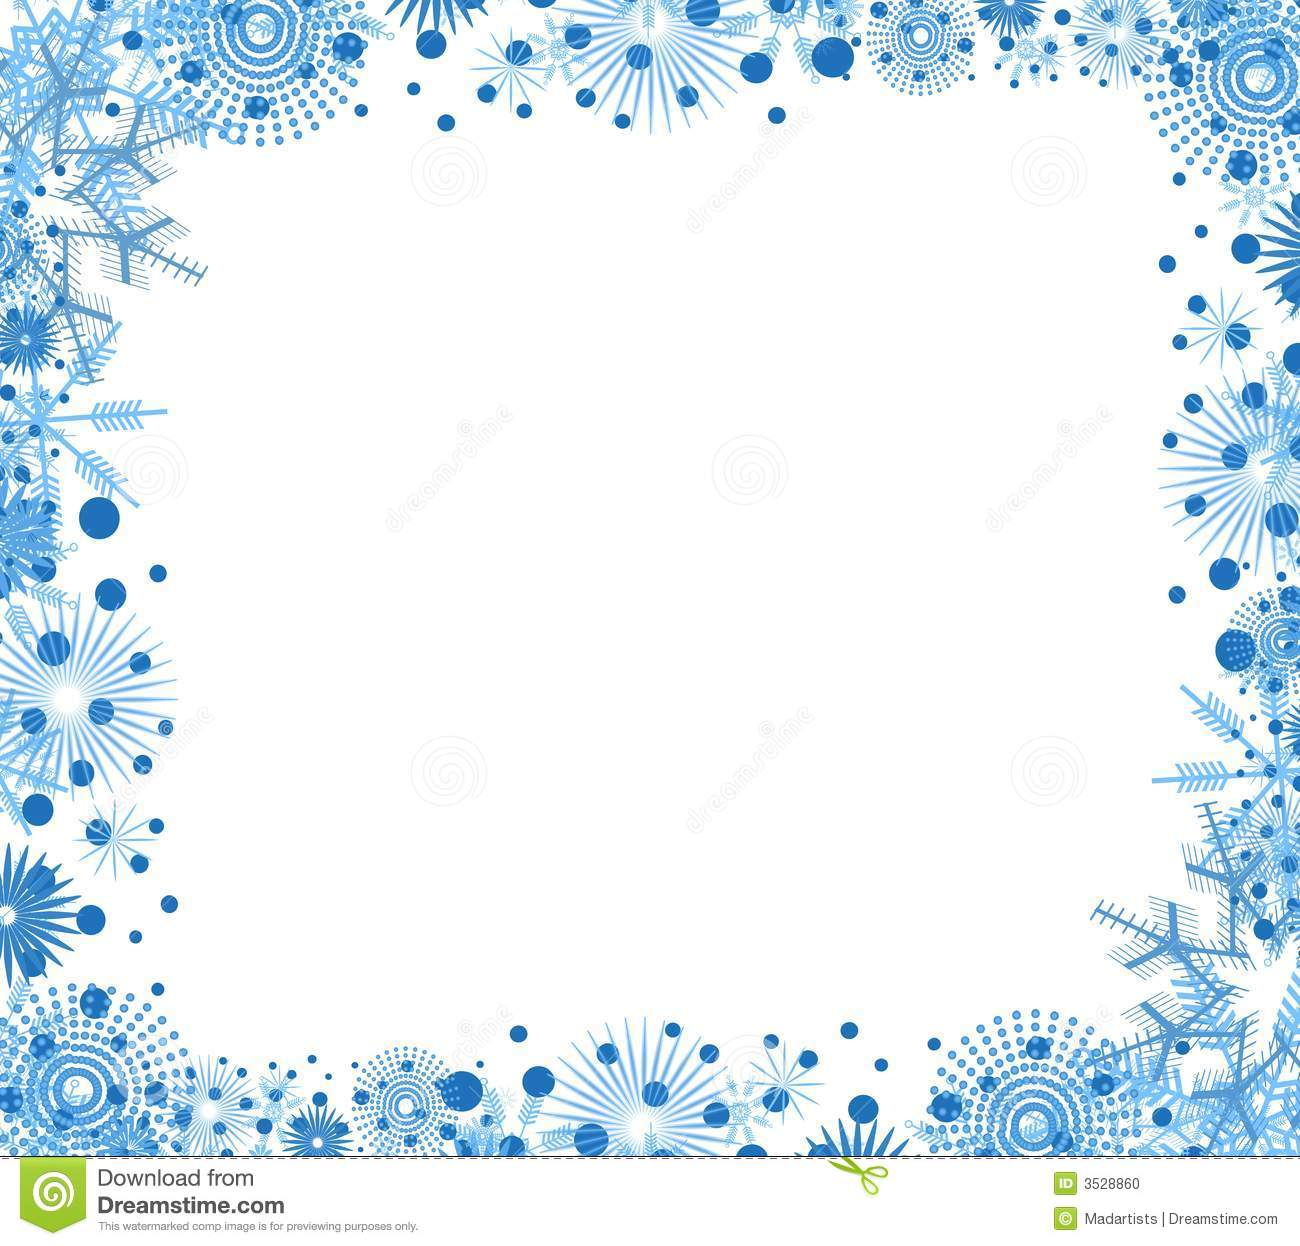 Clip Art Background Border Featuring Decorative Blue Snowflakes